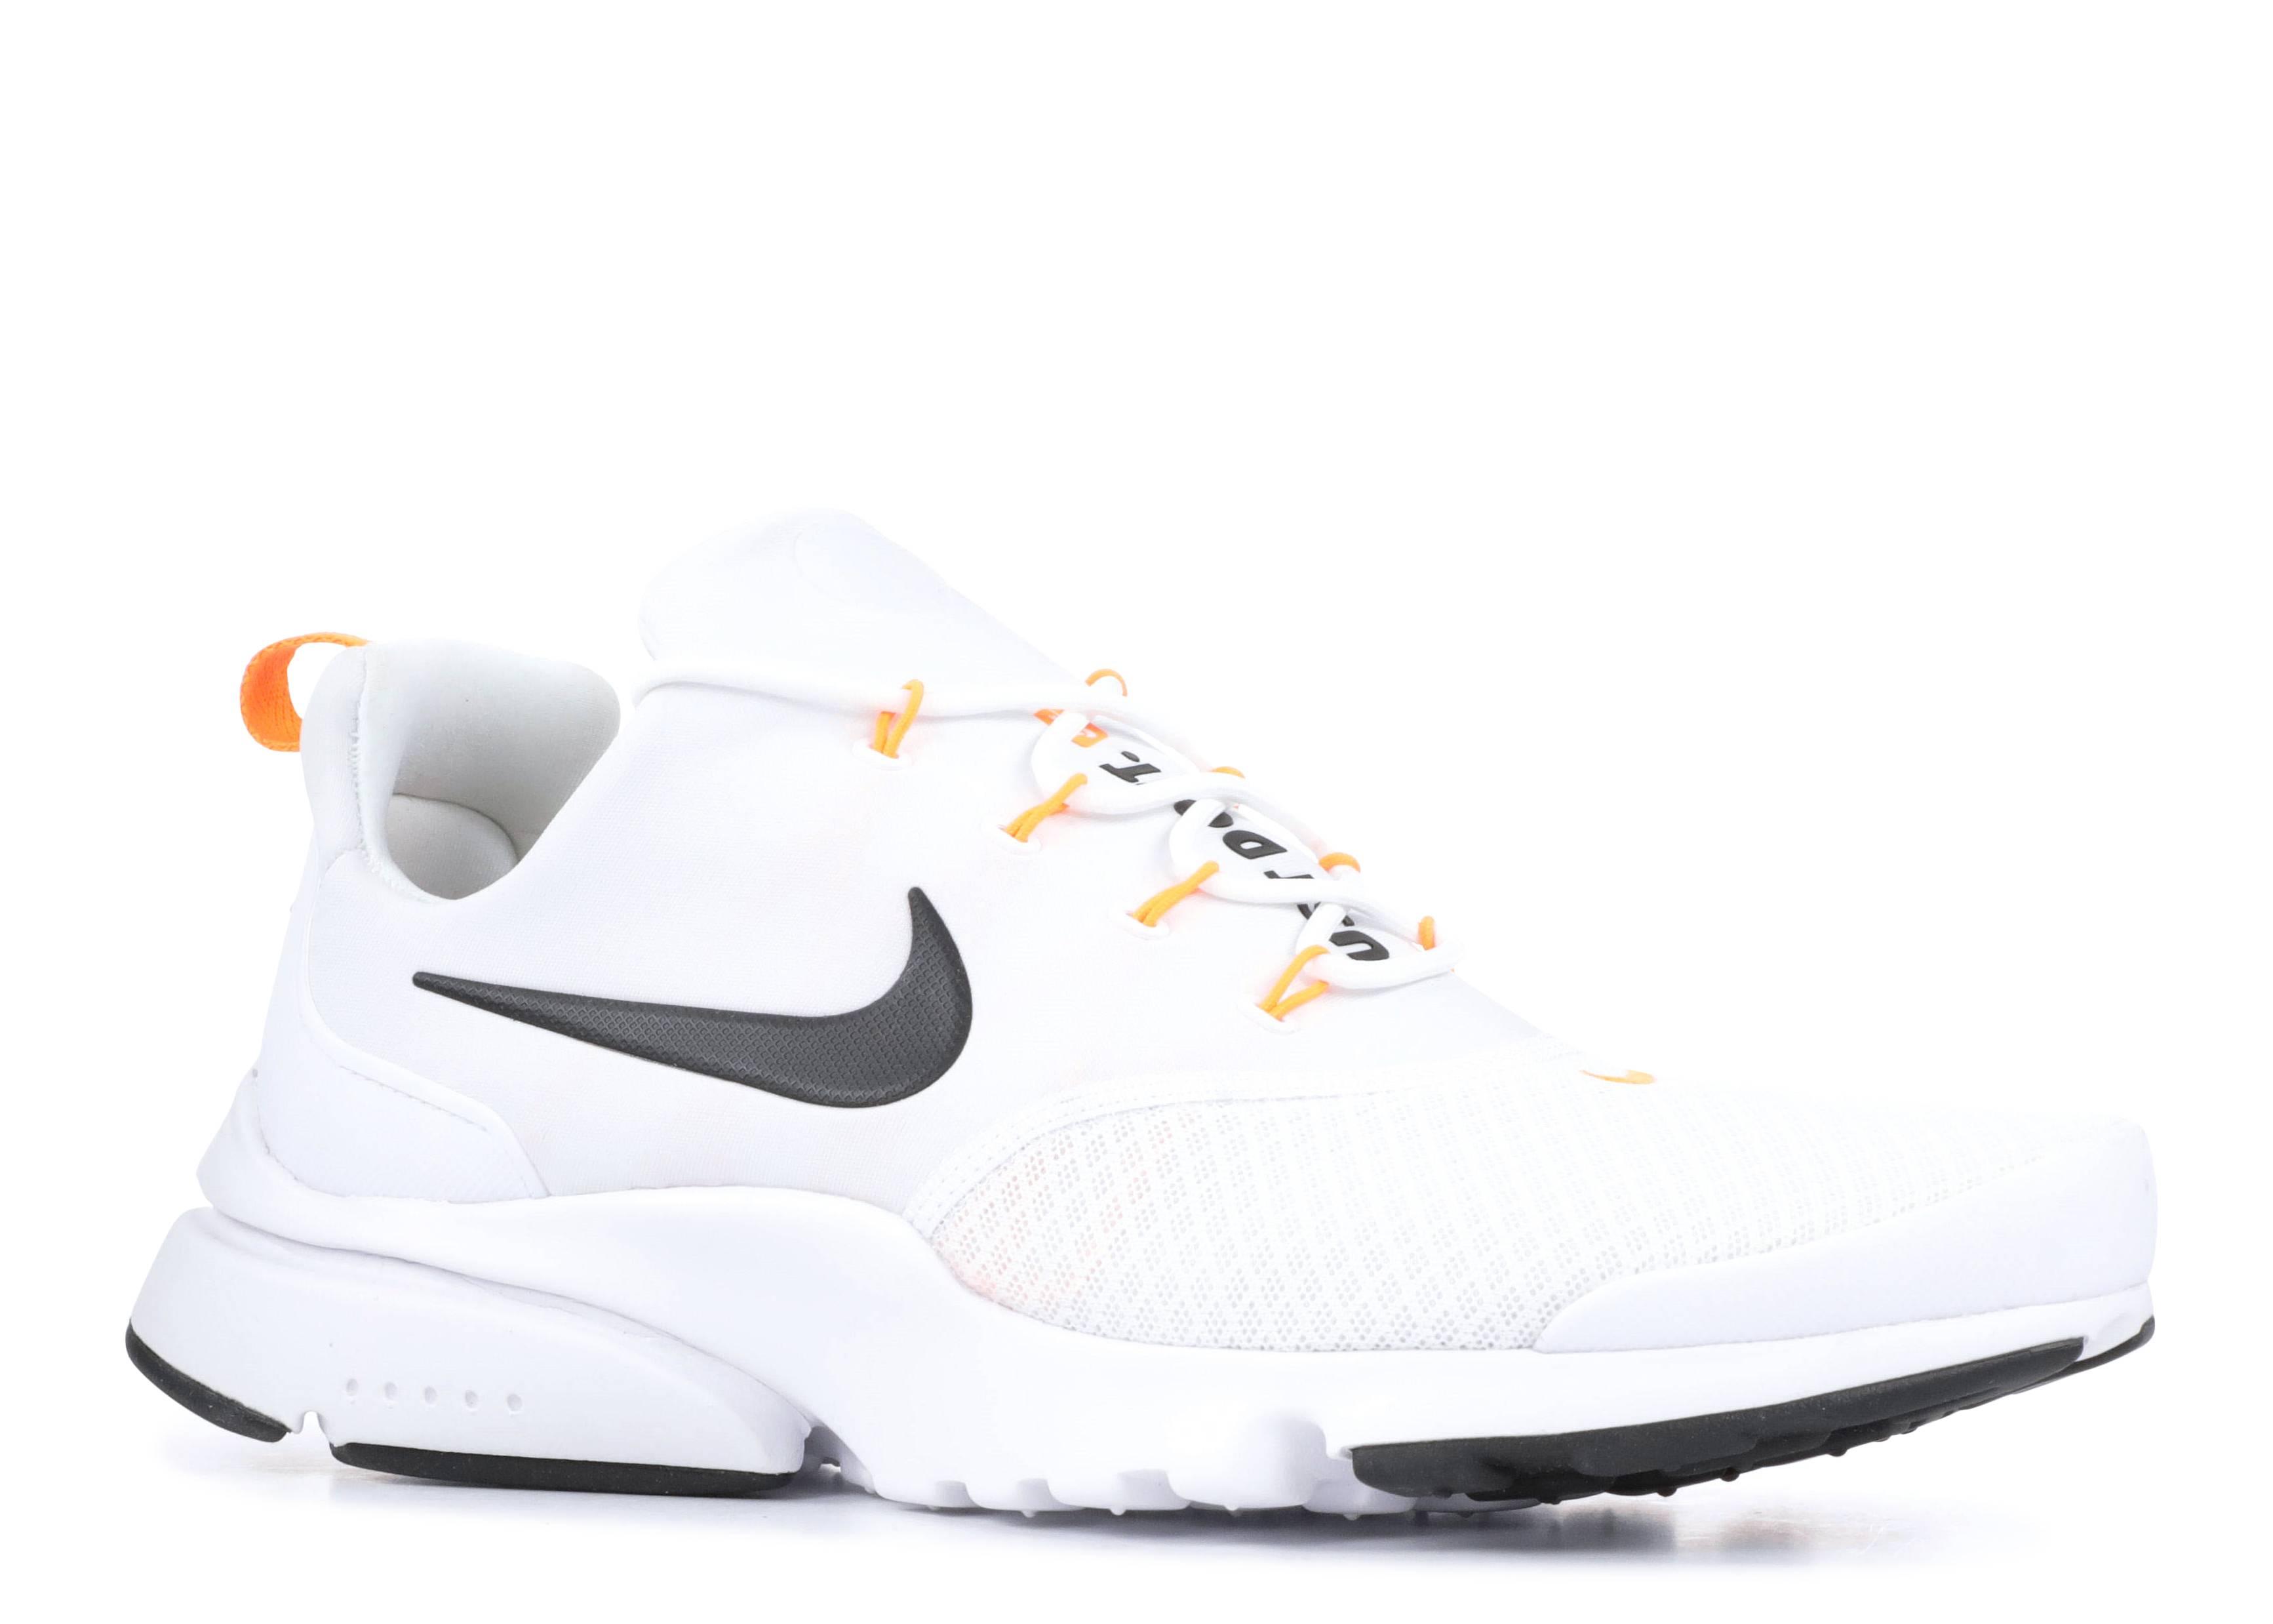 promo code 69ad3 b25d0 Nike Presto Fly Jdi